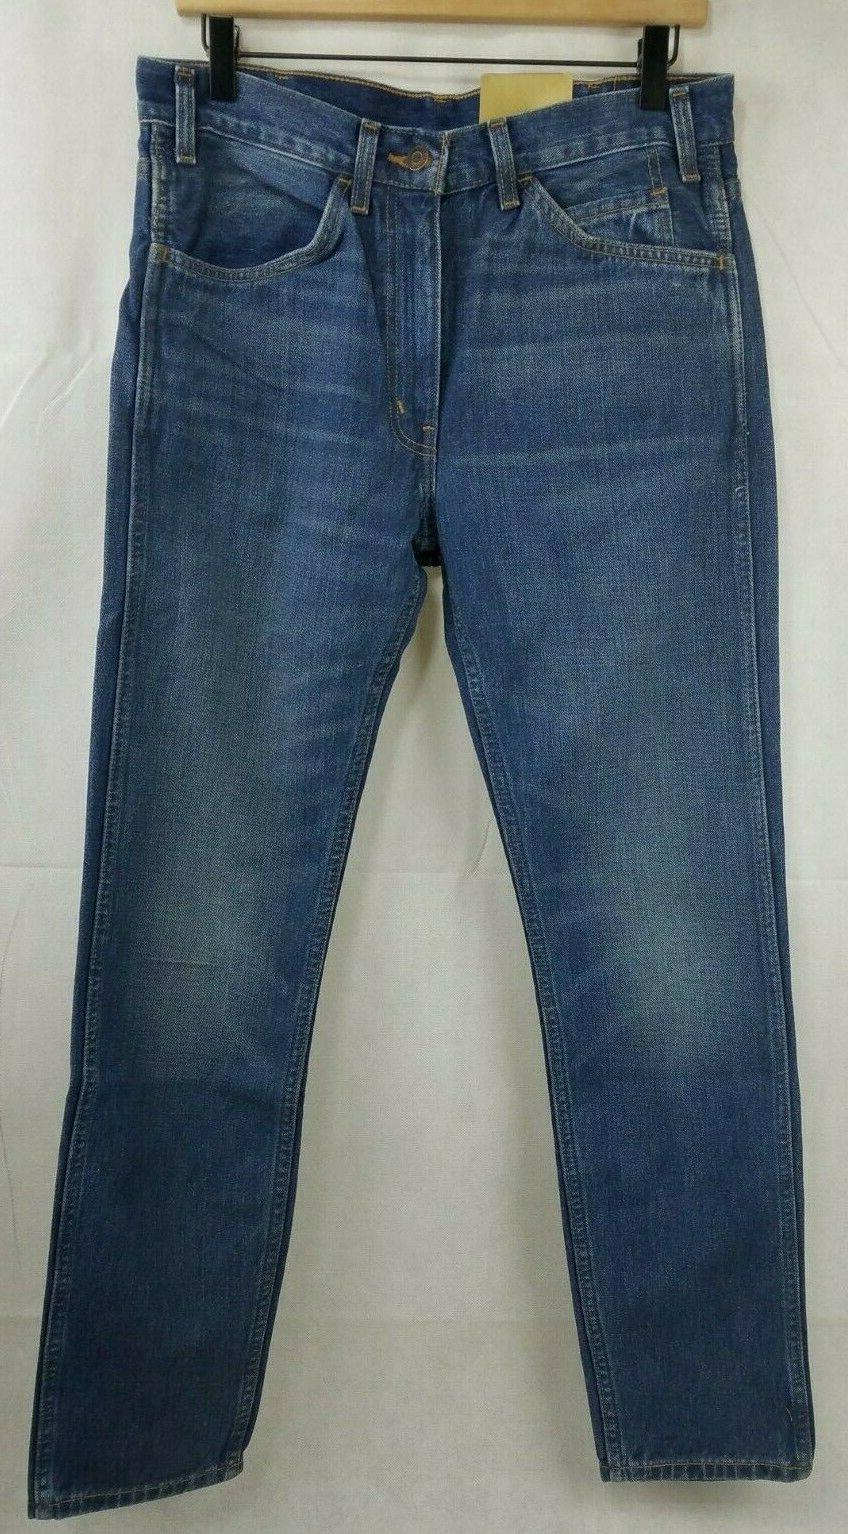 Levi's Vintage Clothing 1969 Orange Tab Slim Fit Jeans NWT MSRP $198